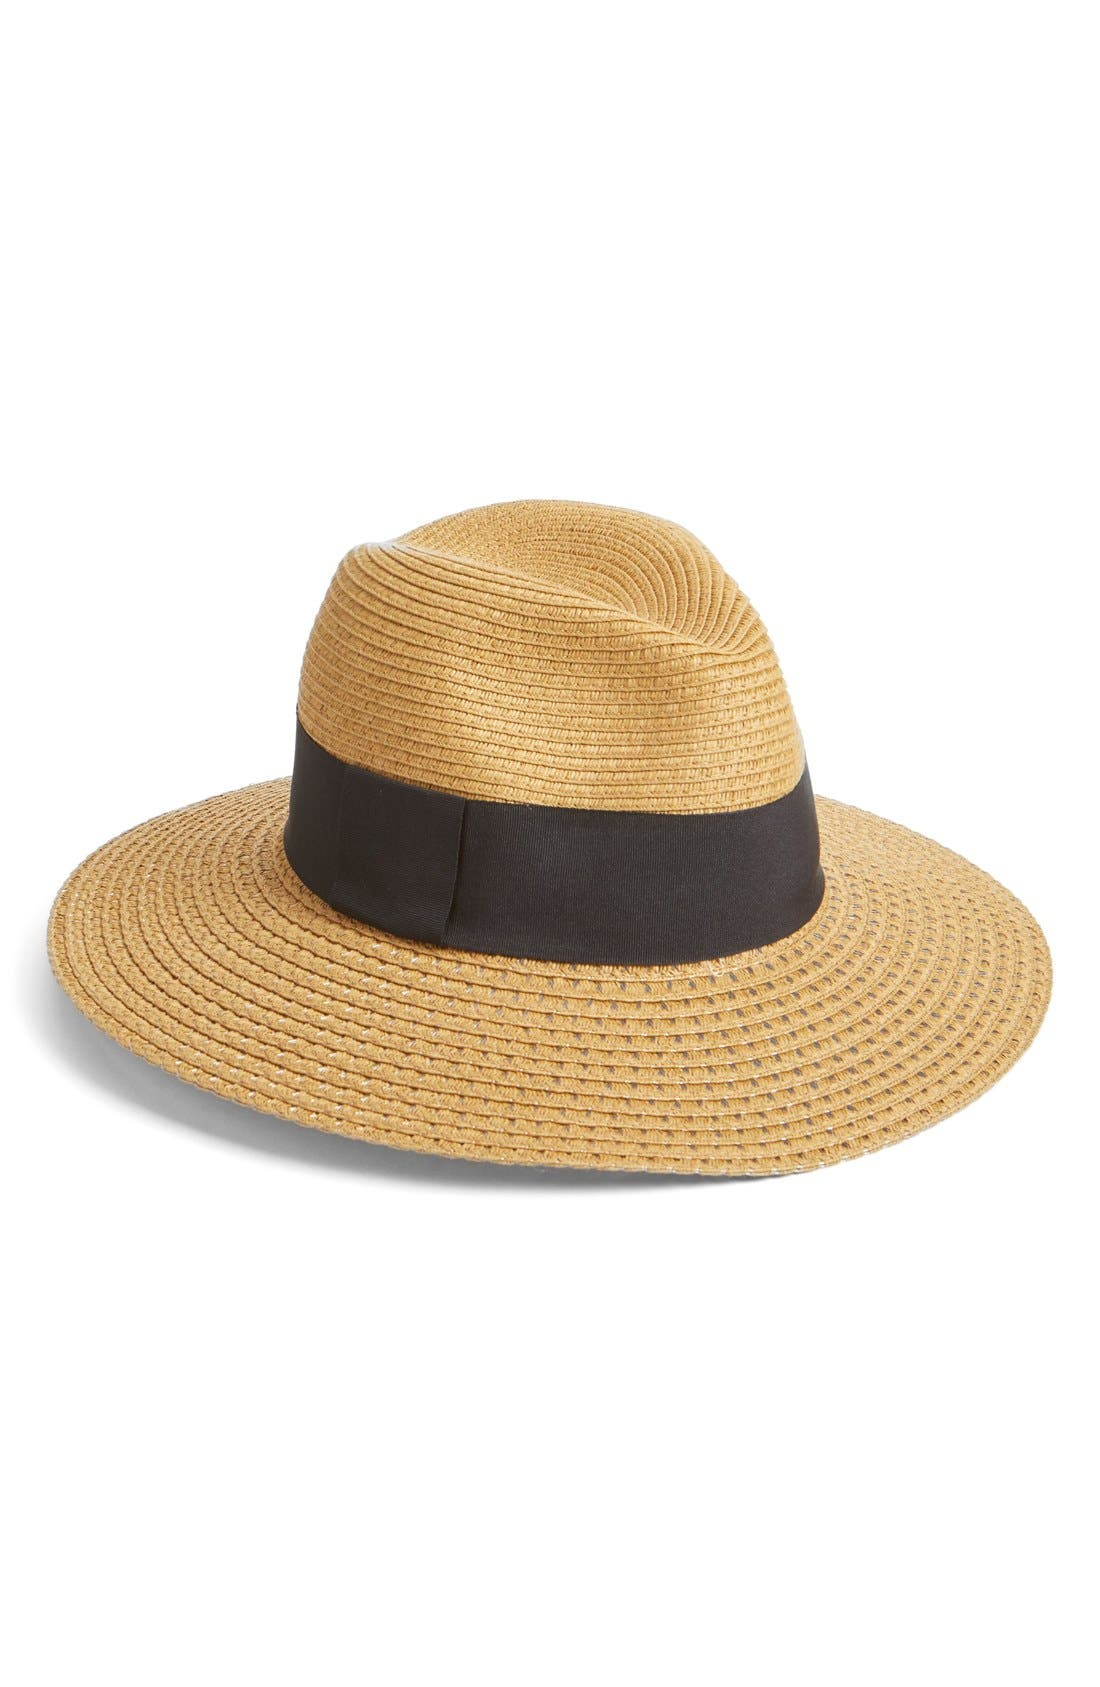 Main Image - Nordstrom Wide Brim Straw Panama Hat